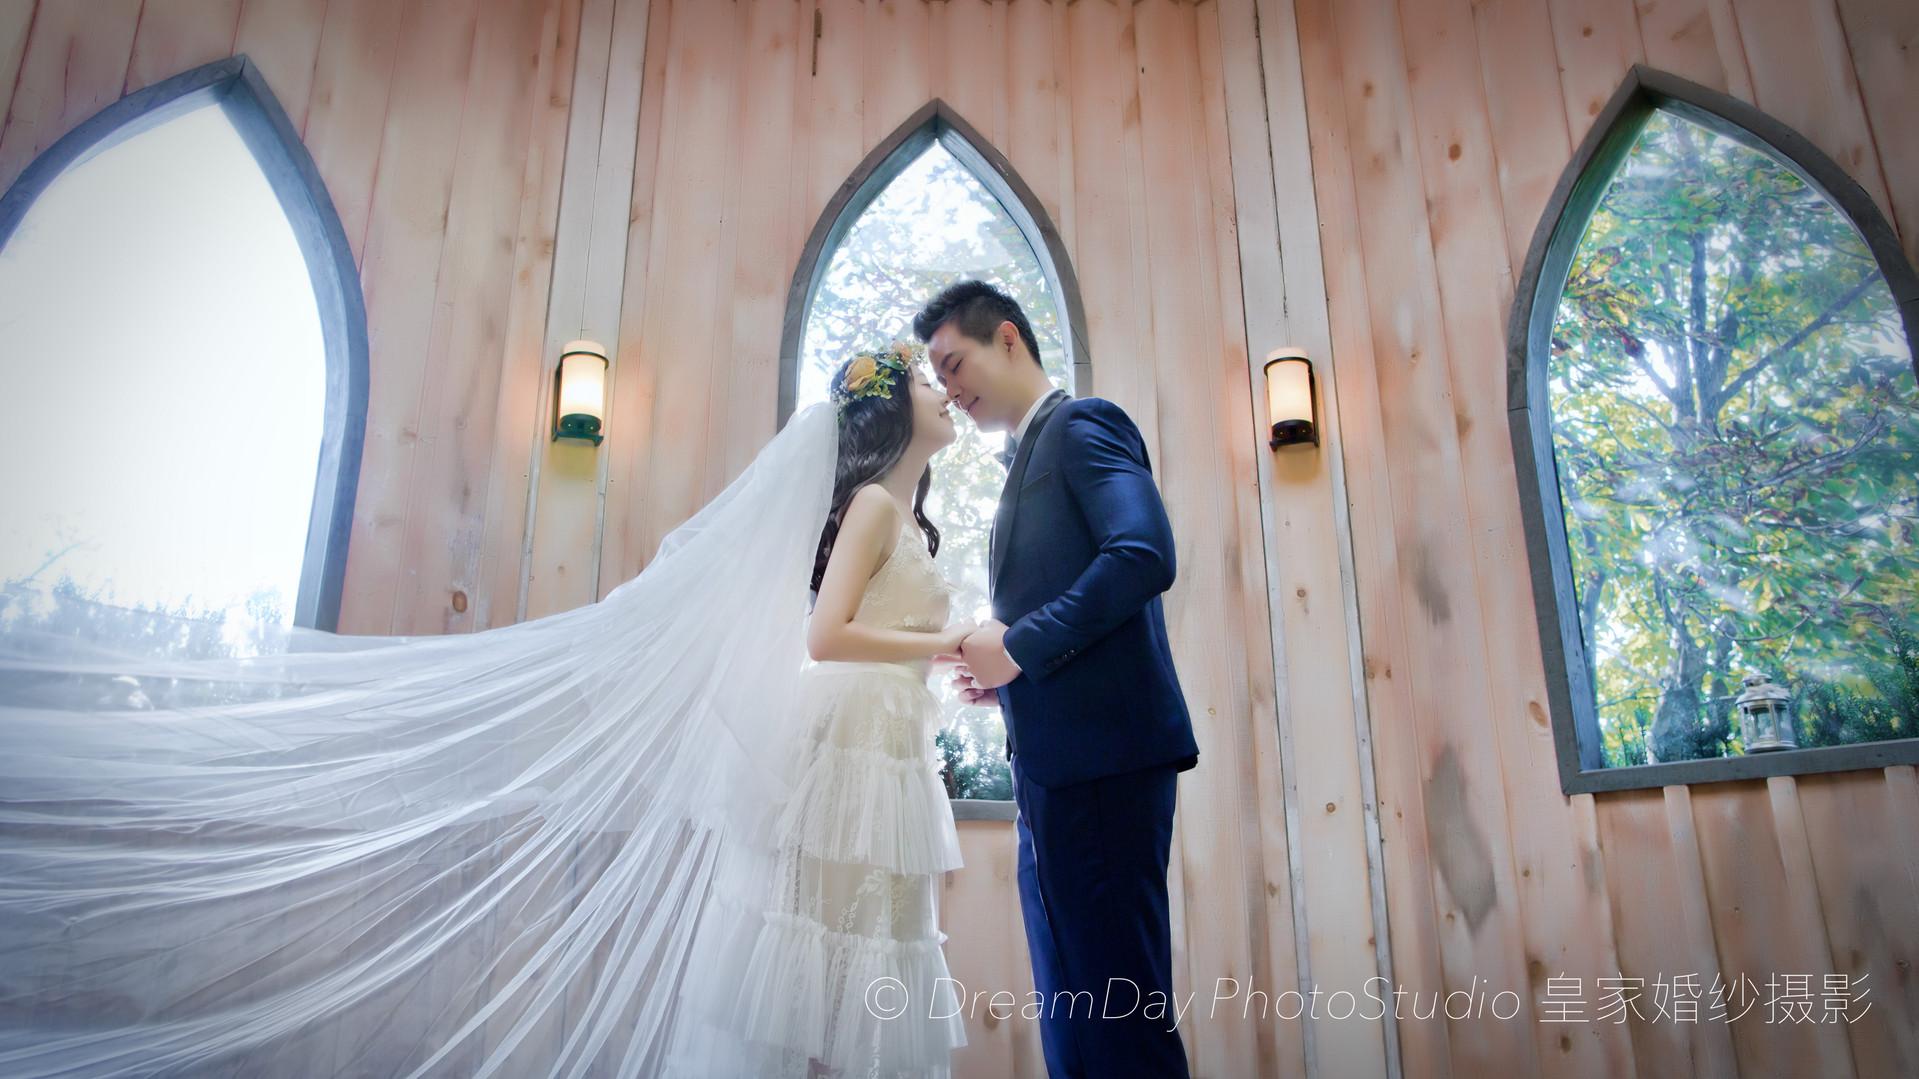 Pre-wedding137.jpg